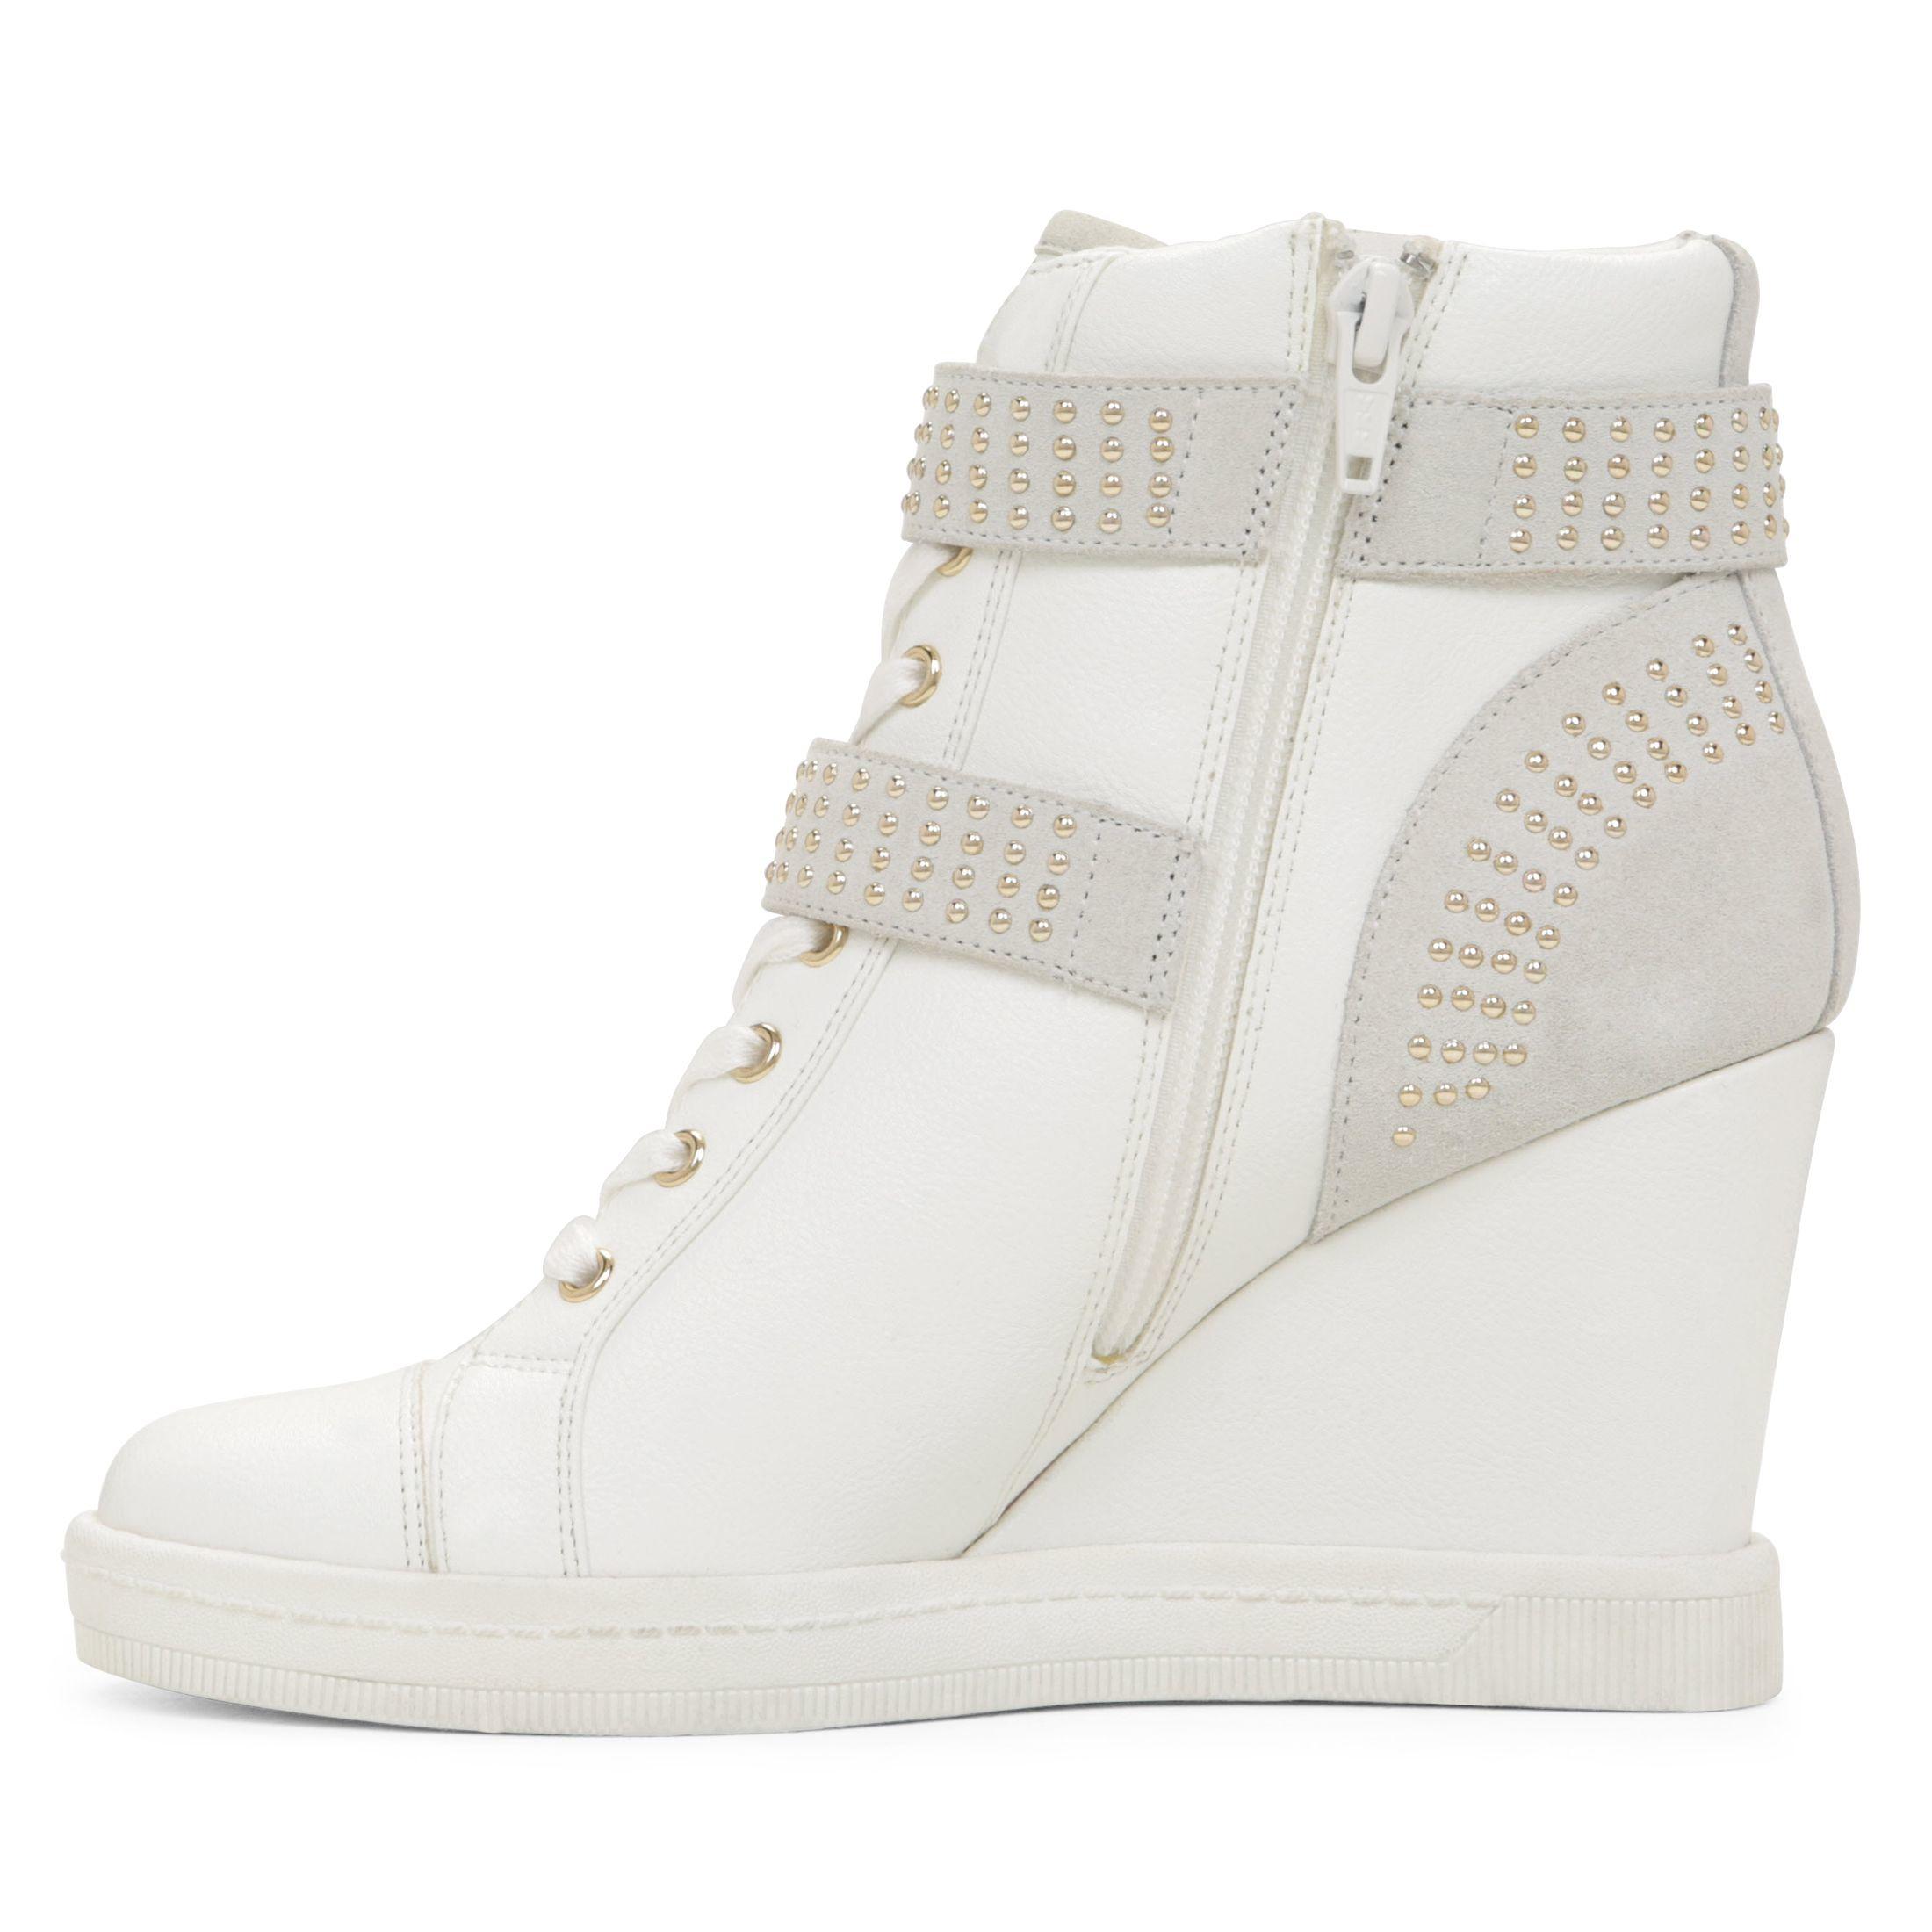 Aldo Verratti Wedge Sneaker in White | Lyst